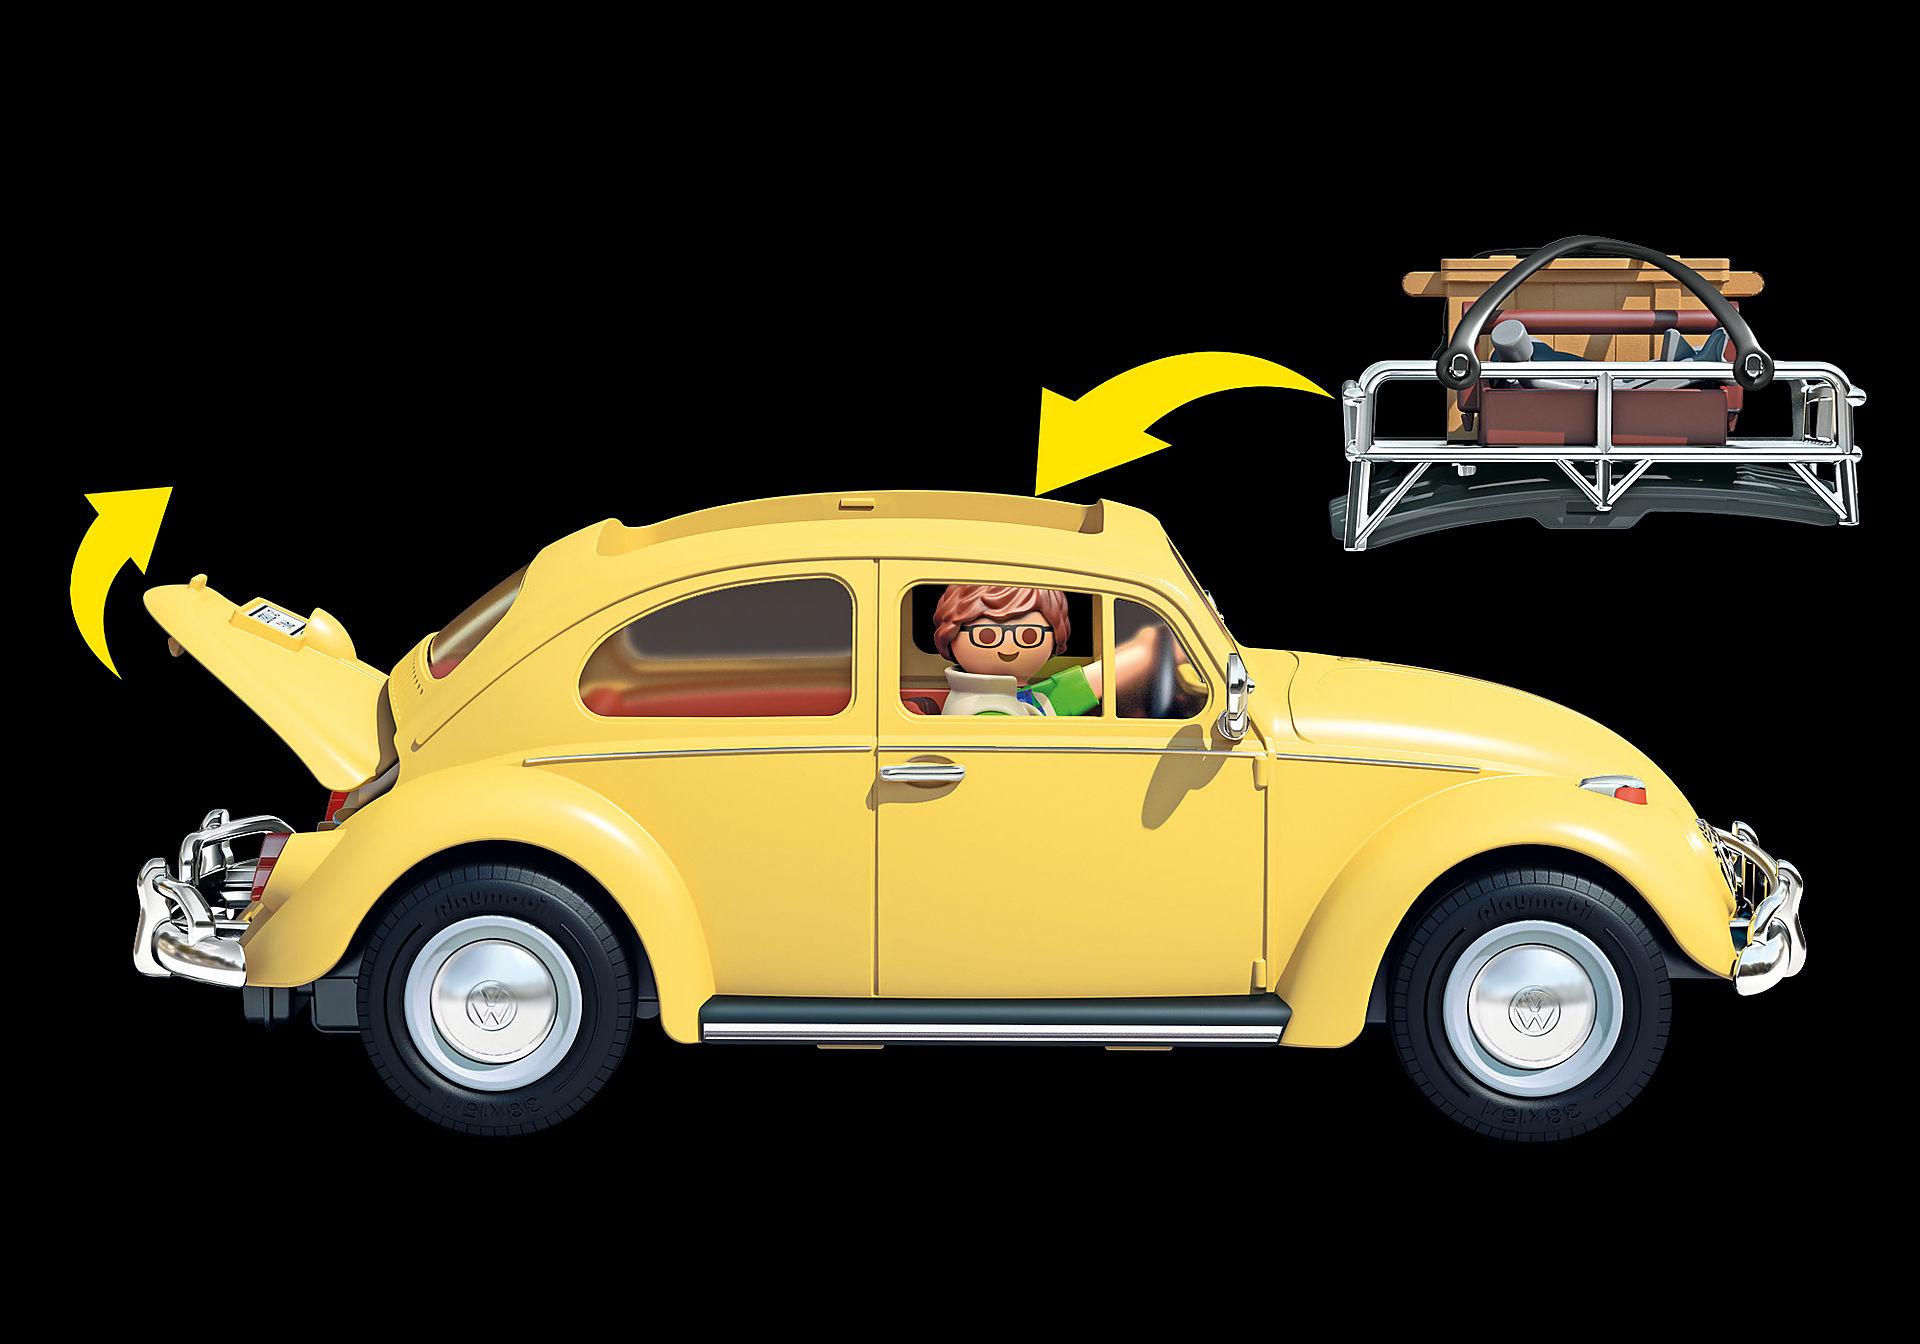 70827 Volkswagen Garbus - Edycja specjalna zoom image5